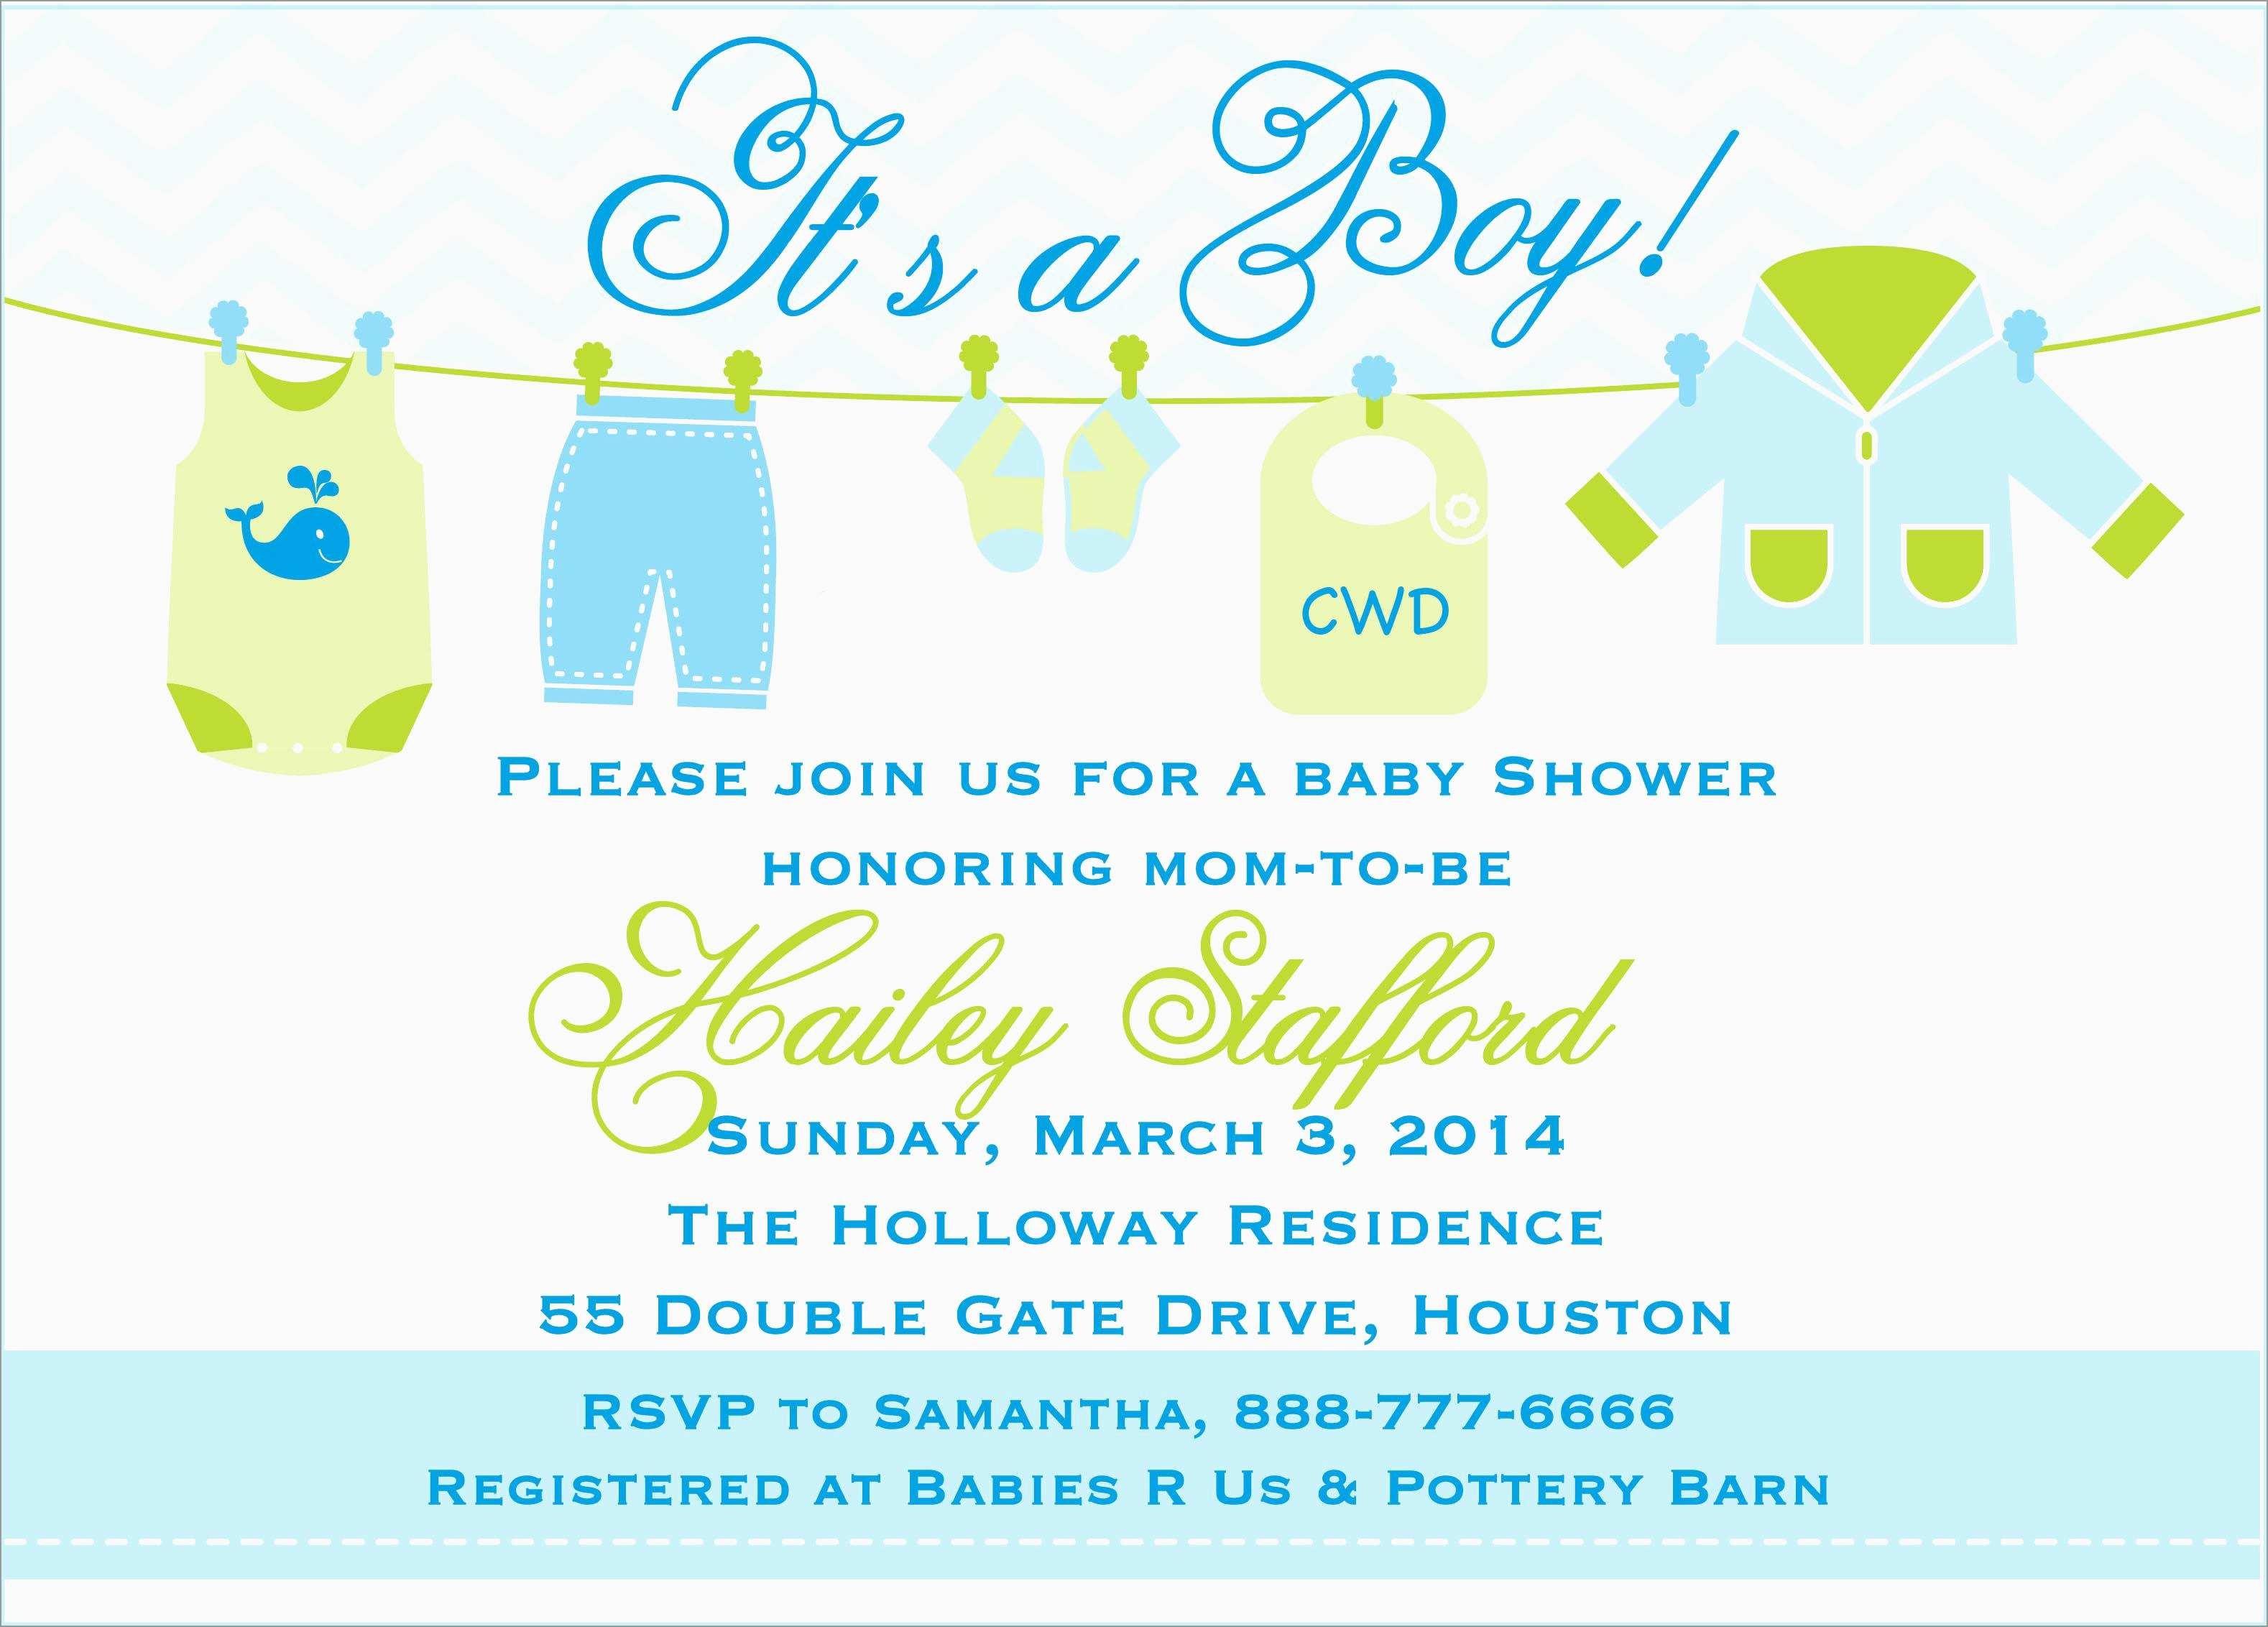 Elegant Free Printable Baby Shower Invitations Templates For Boys - Baby Shower Invitations Free Printable For A Boy